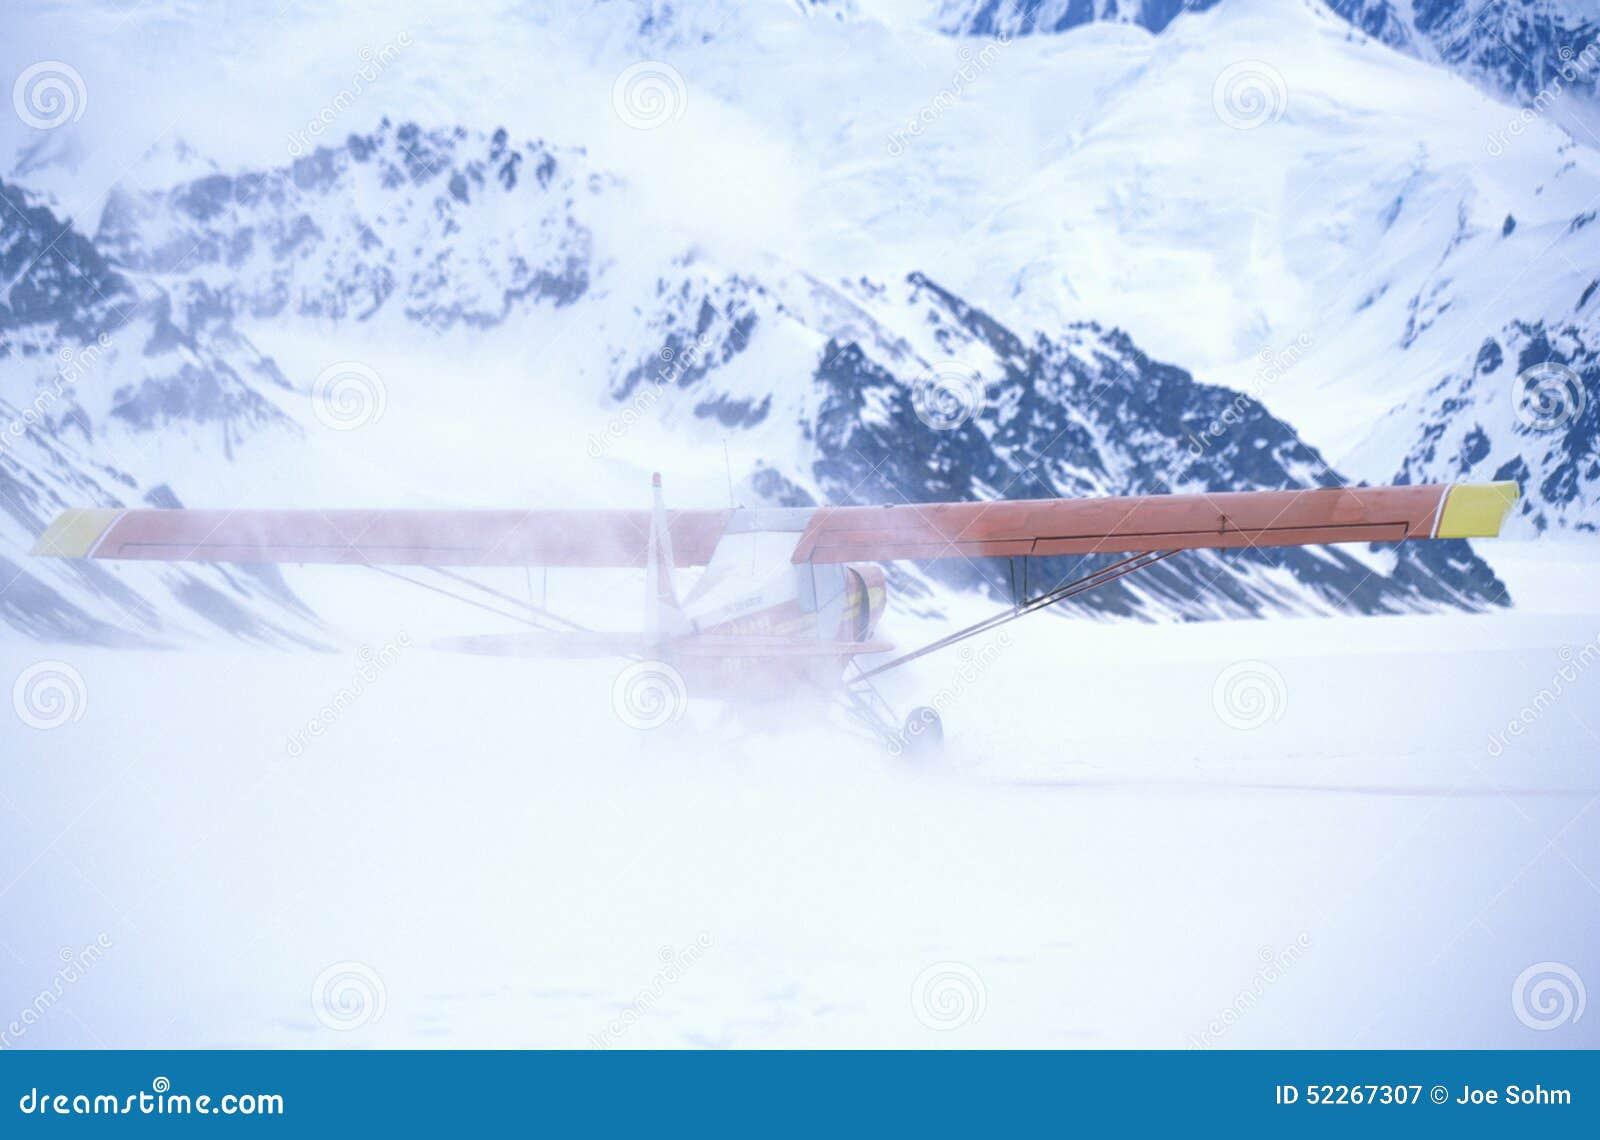 Super Cub  Piper Bush Airplane On Glacier In St  Elias